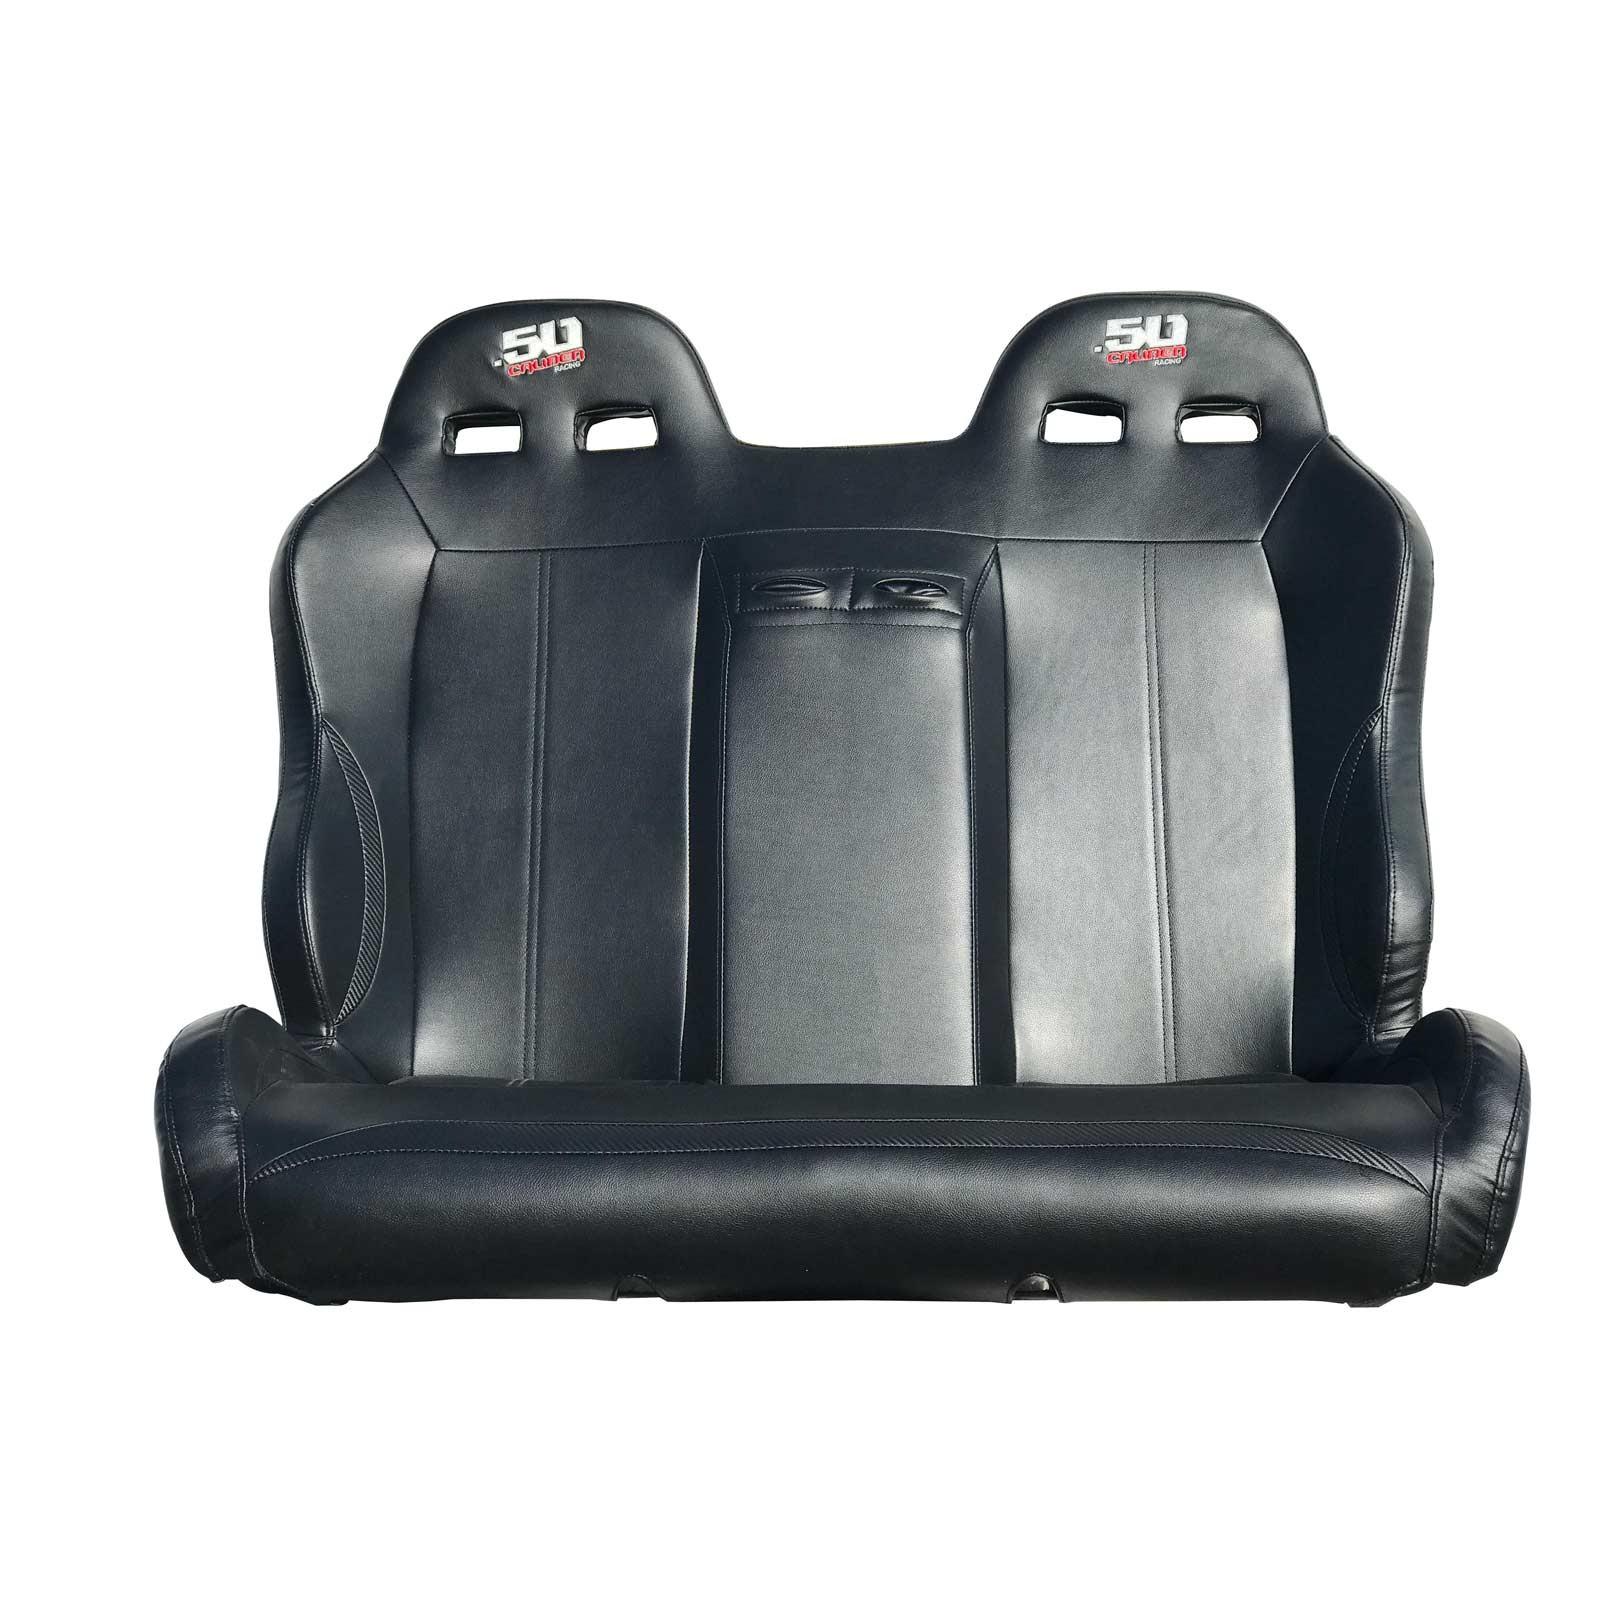 Fabulous Rear Bench Seat Carbon Fiber Polaris Rzr Xp1000 Turbo S 900 Gamerscity Chair Design For Home Gamerscityorg